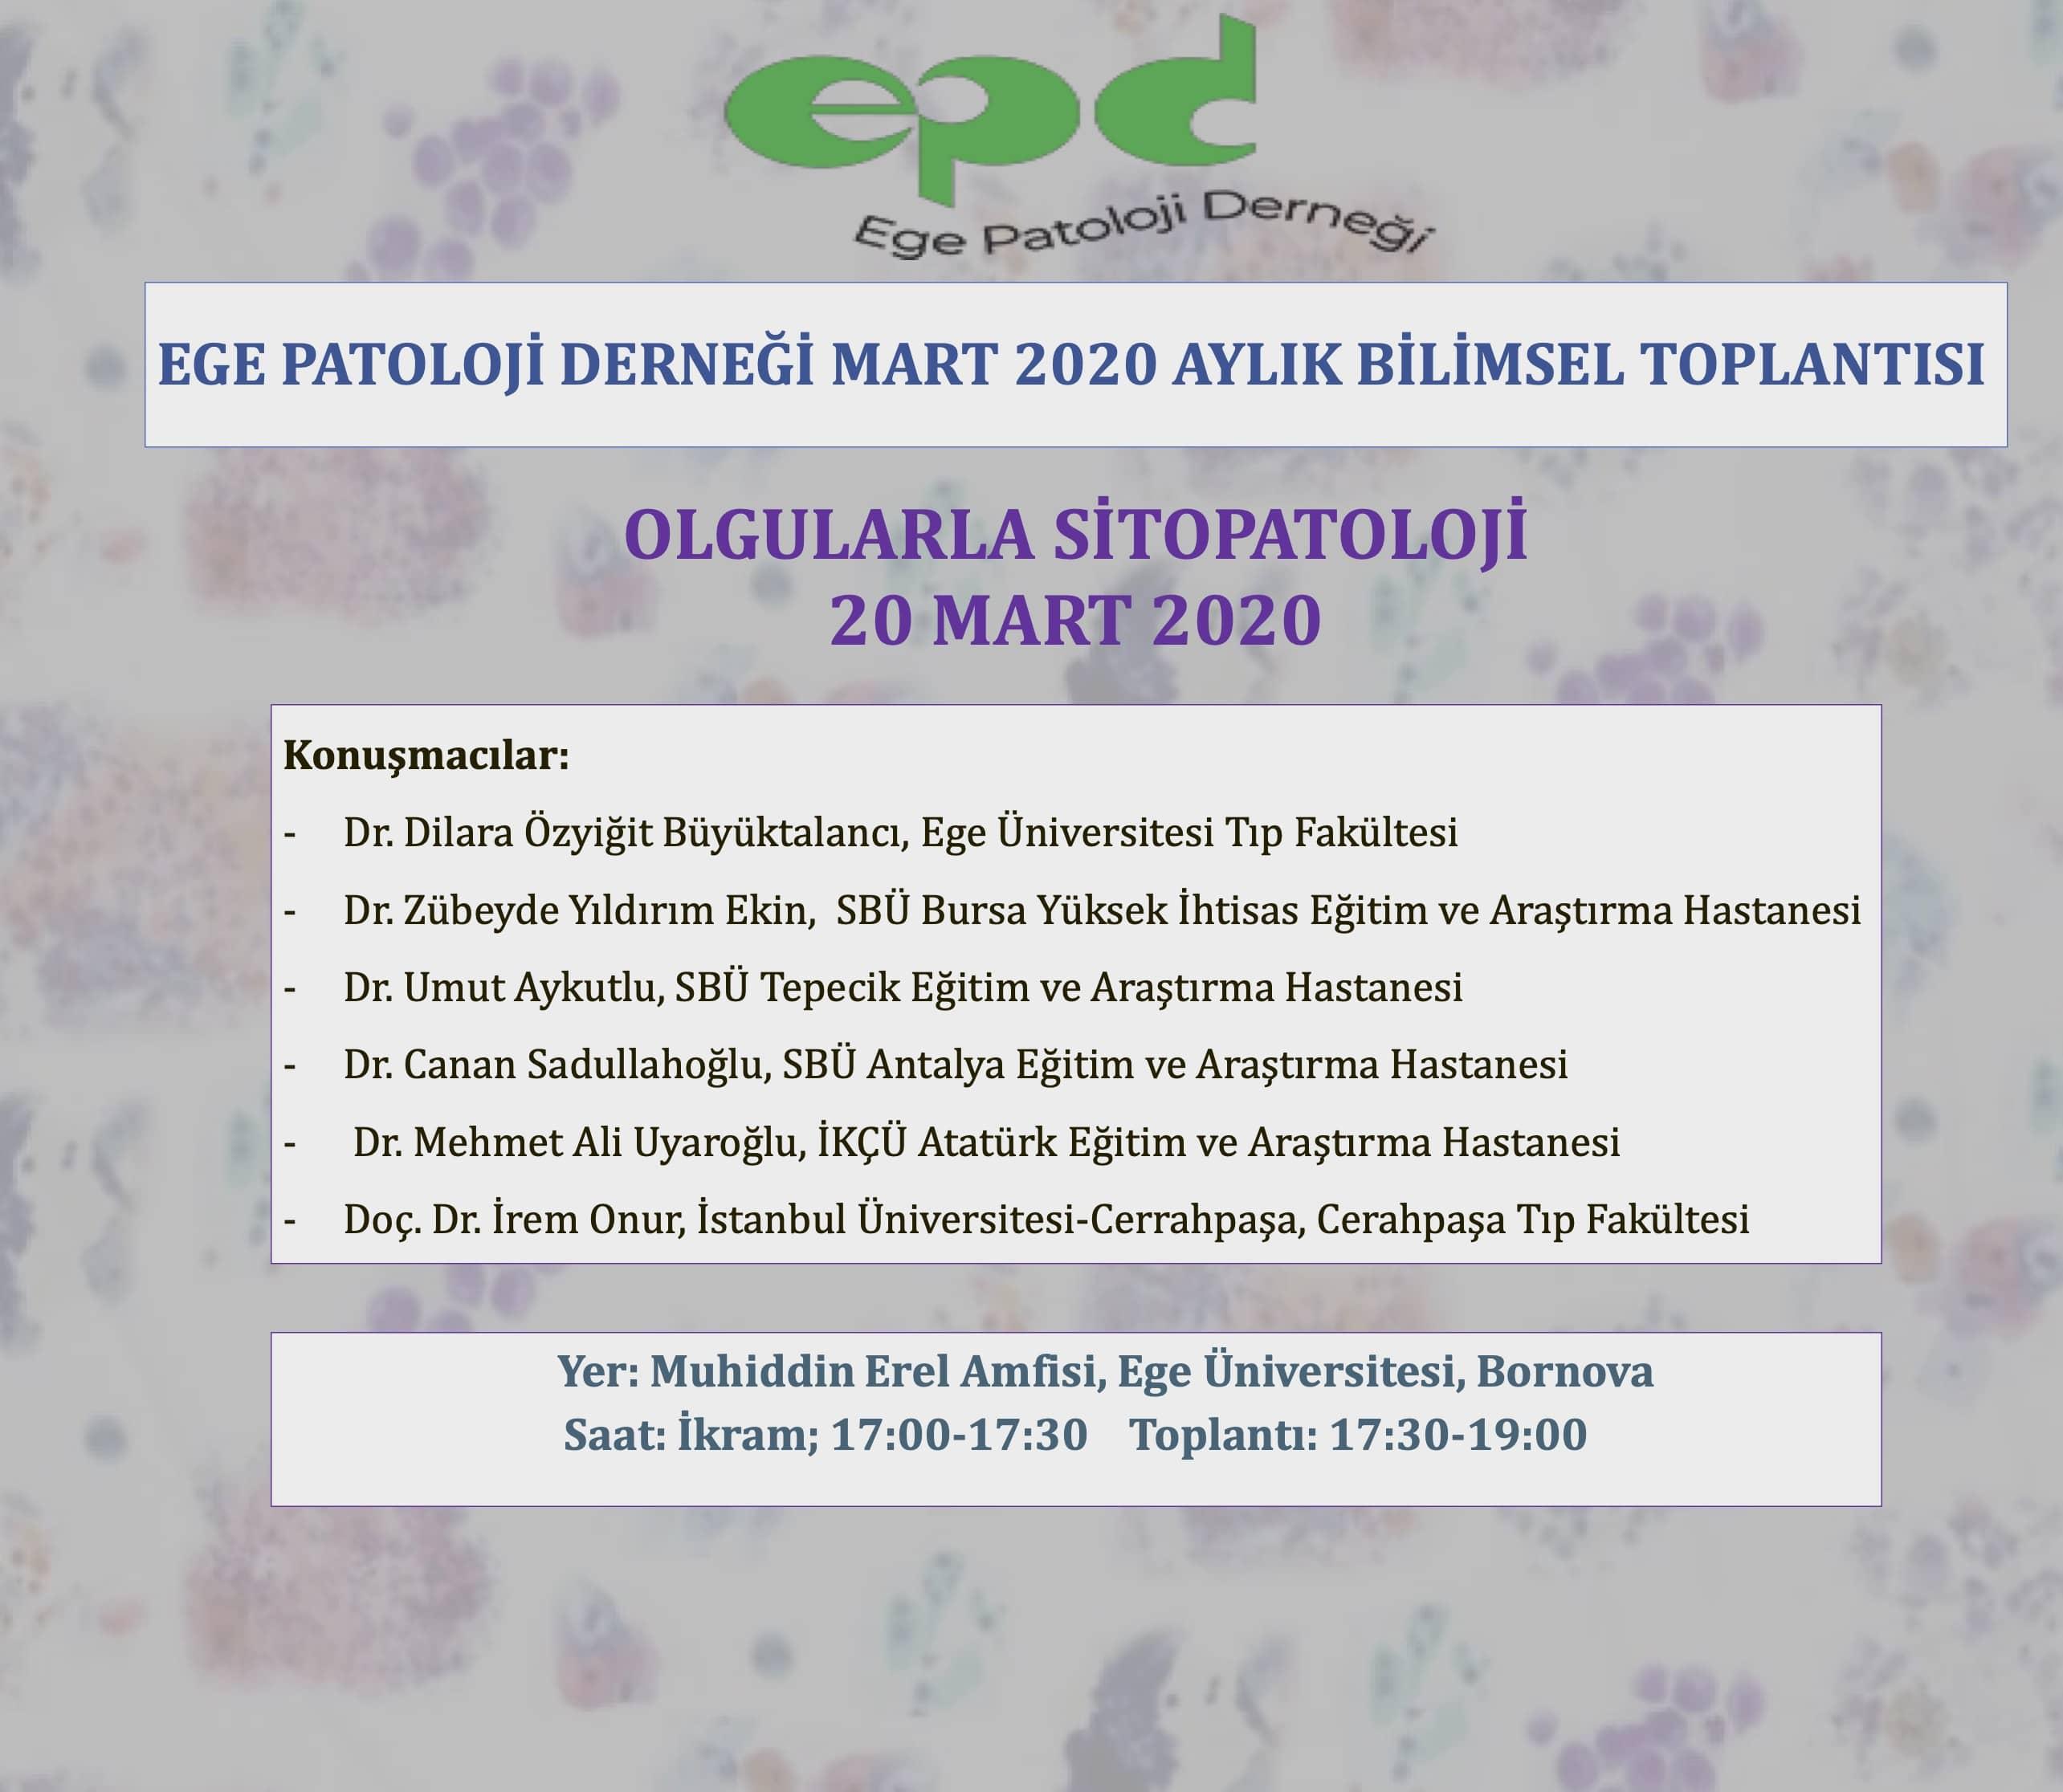 20 Mart 2020 - OLGULARLA SİTOPATOLOJİ